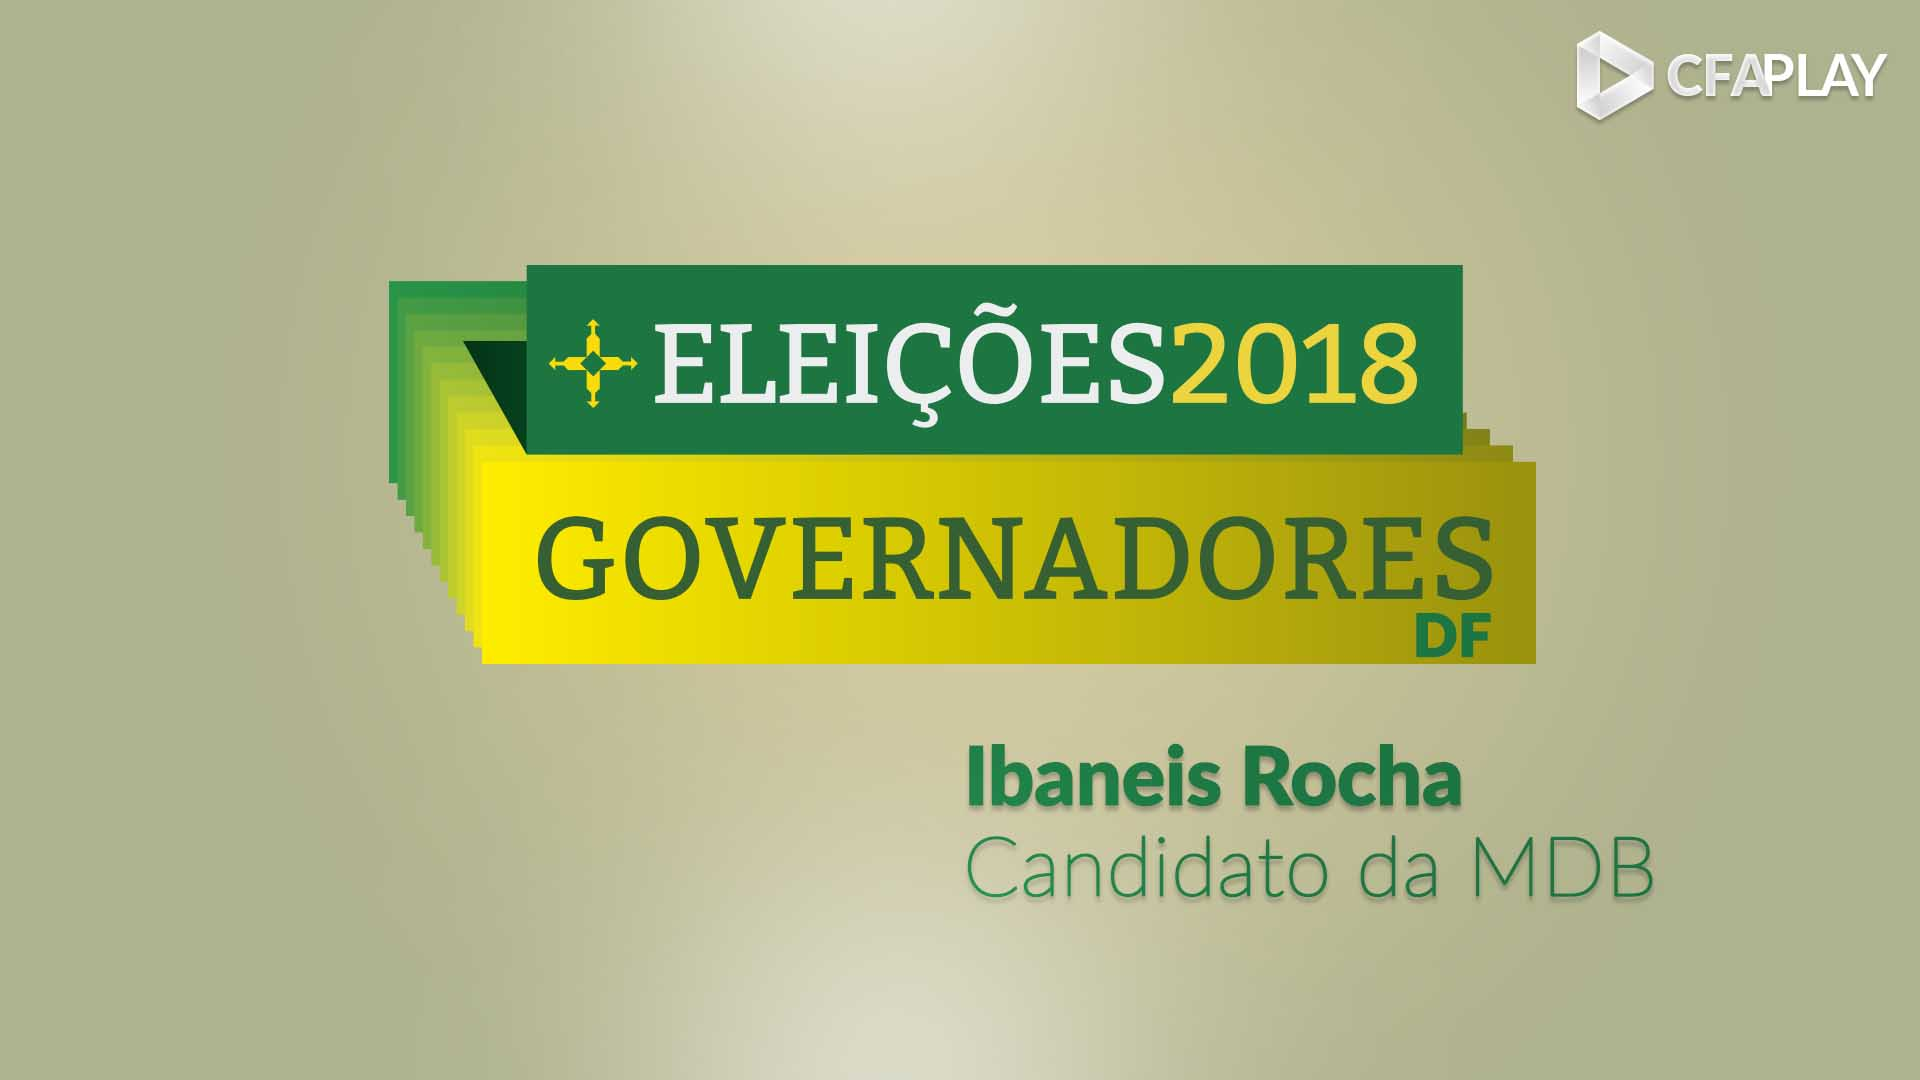 Governadores GDF 2018: Análise do candidato Ibaneis Rocha (MDB)